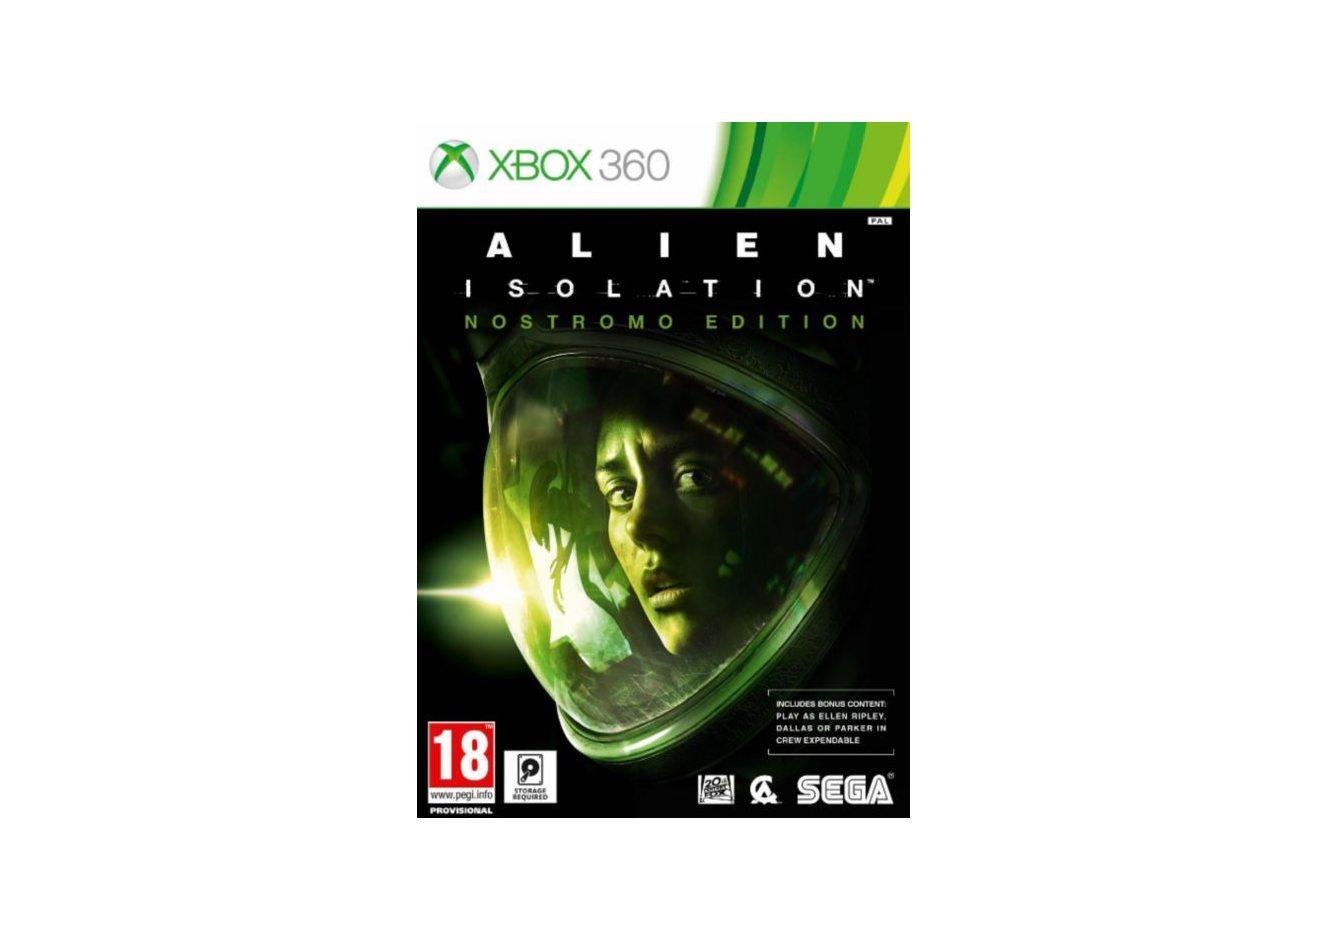 Xbox 360 Alien: Isolation. Nostromo Edition Xbox 360